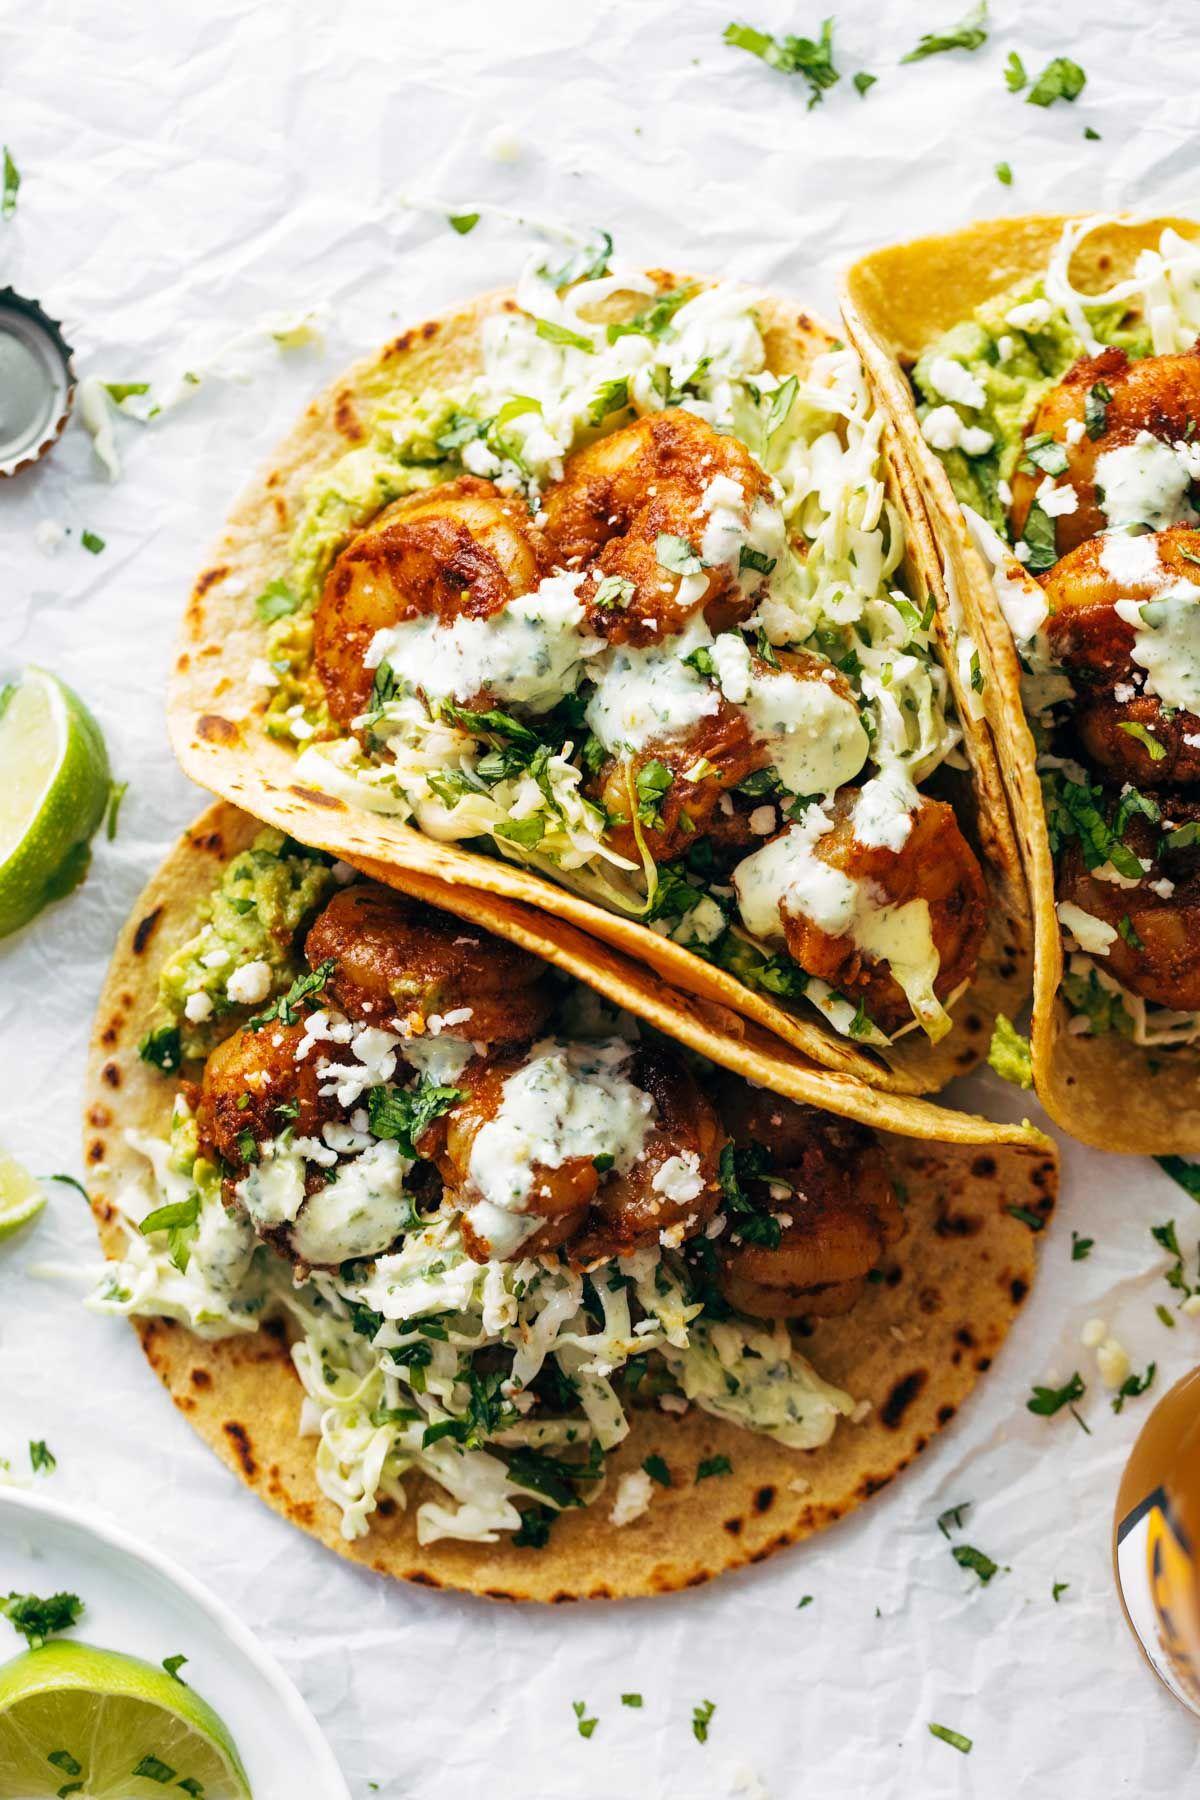 Spicy Shrimp Tacos with Garlic Cilantro Lime Slaw #cilantrolimeslaw